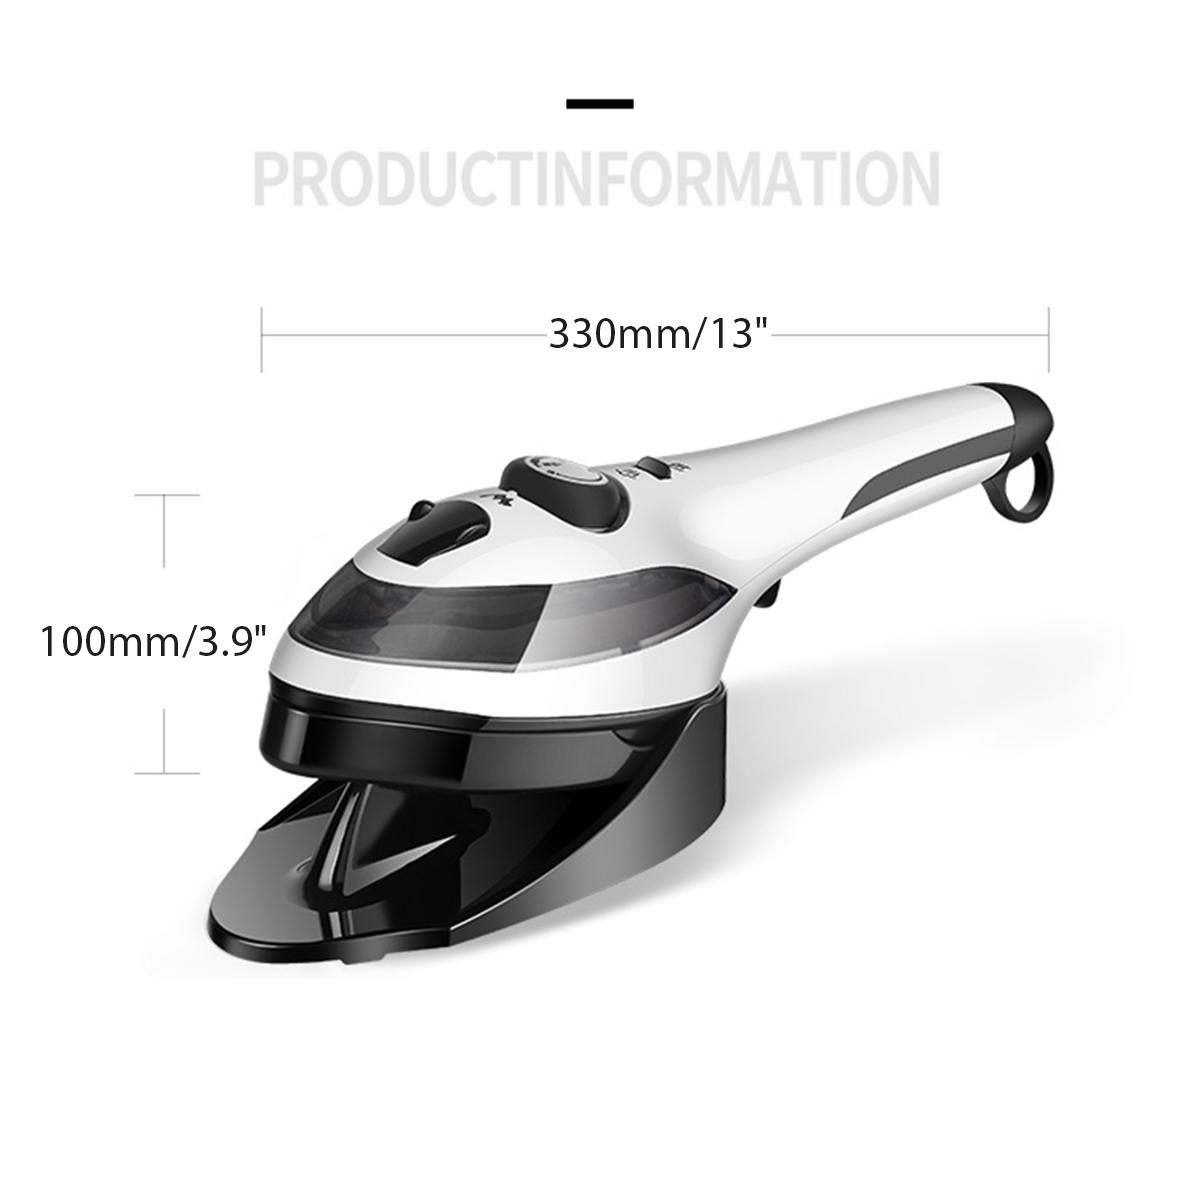 220V 880W Rapid Warming Multifunctional Steam Iron Handheld Garment Steamer Ironing